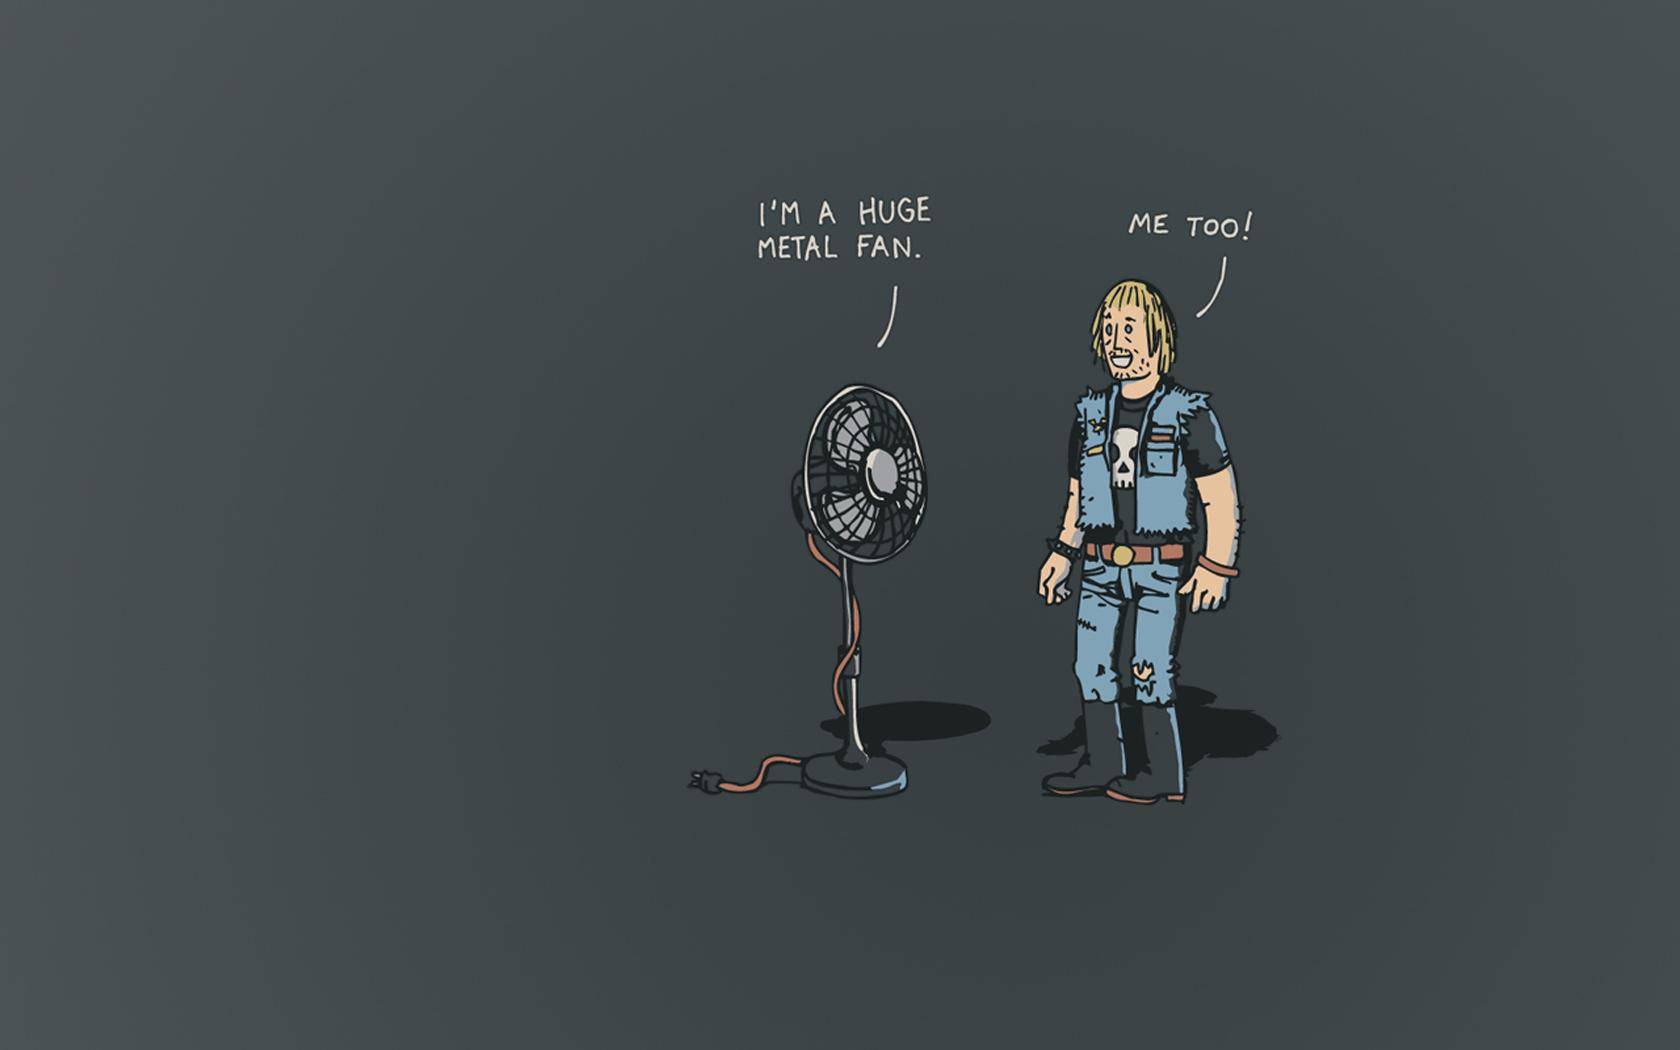 Funny Computer Backgrounds Meme : Humor and funny wallpapers wallpapersafari